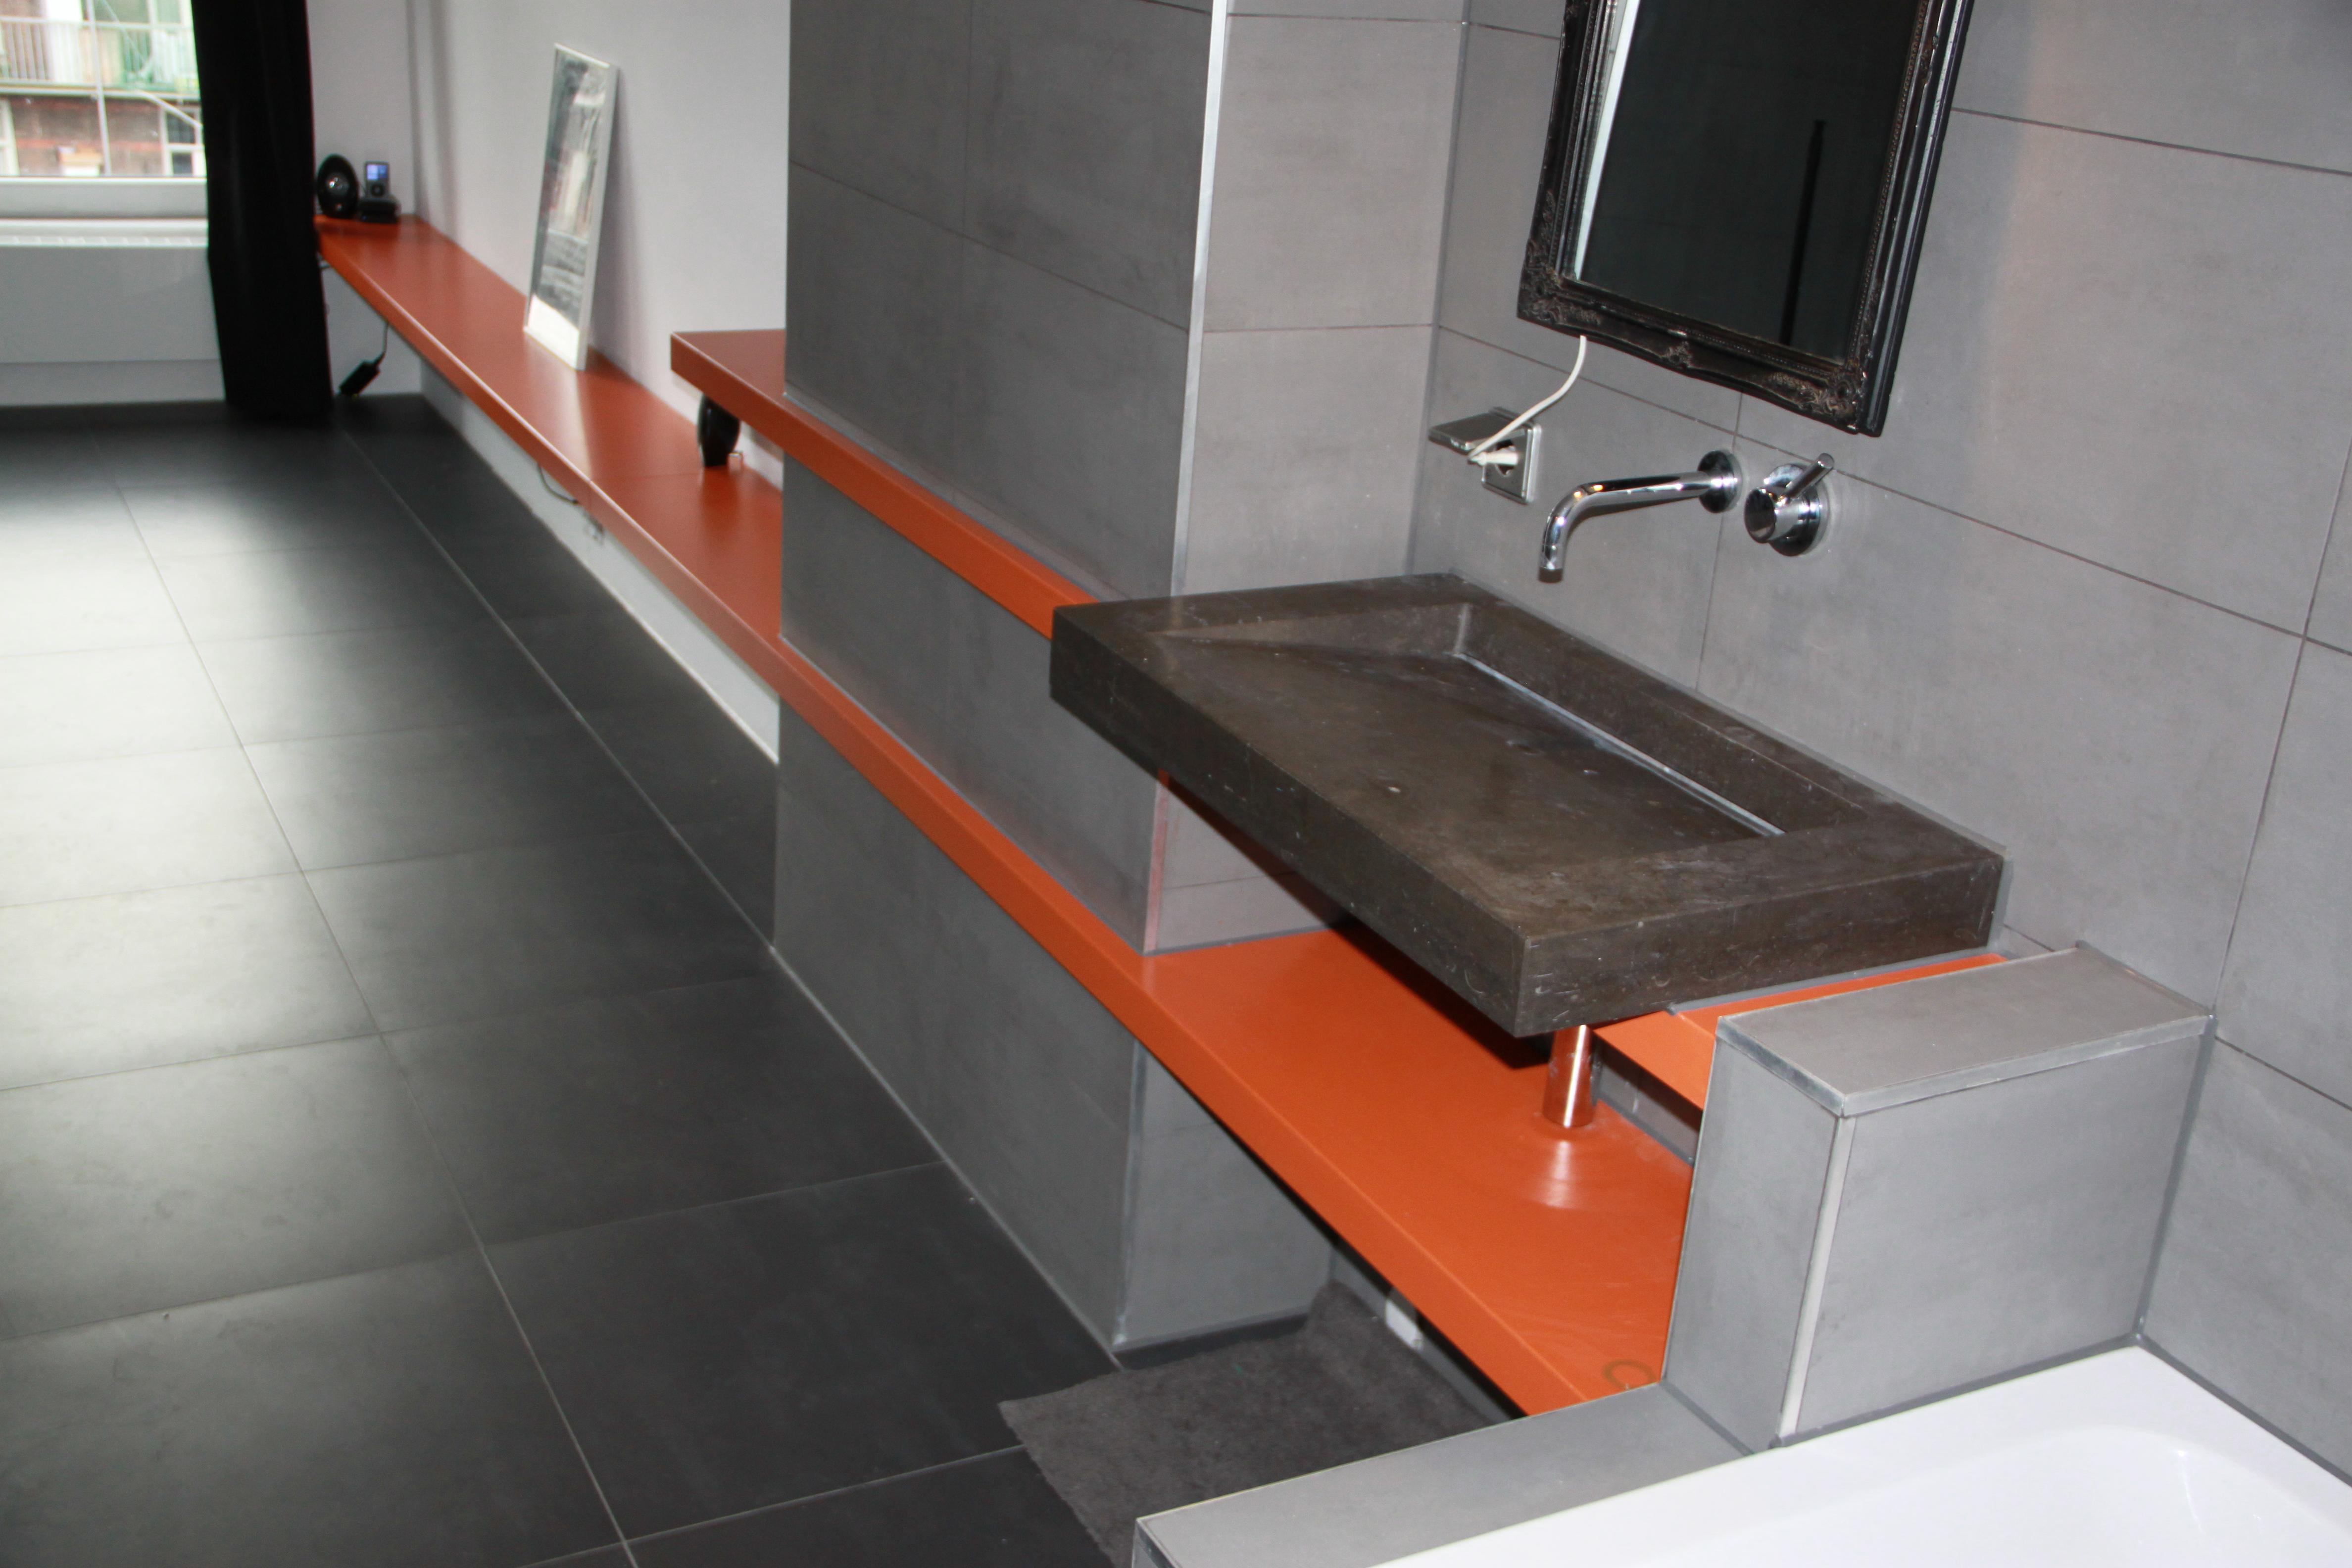 Zwevende plank beer hendriks maatwerk meubels - Plank wandmeubel ...